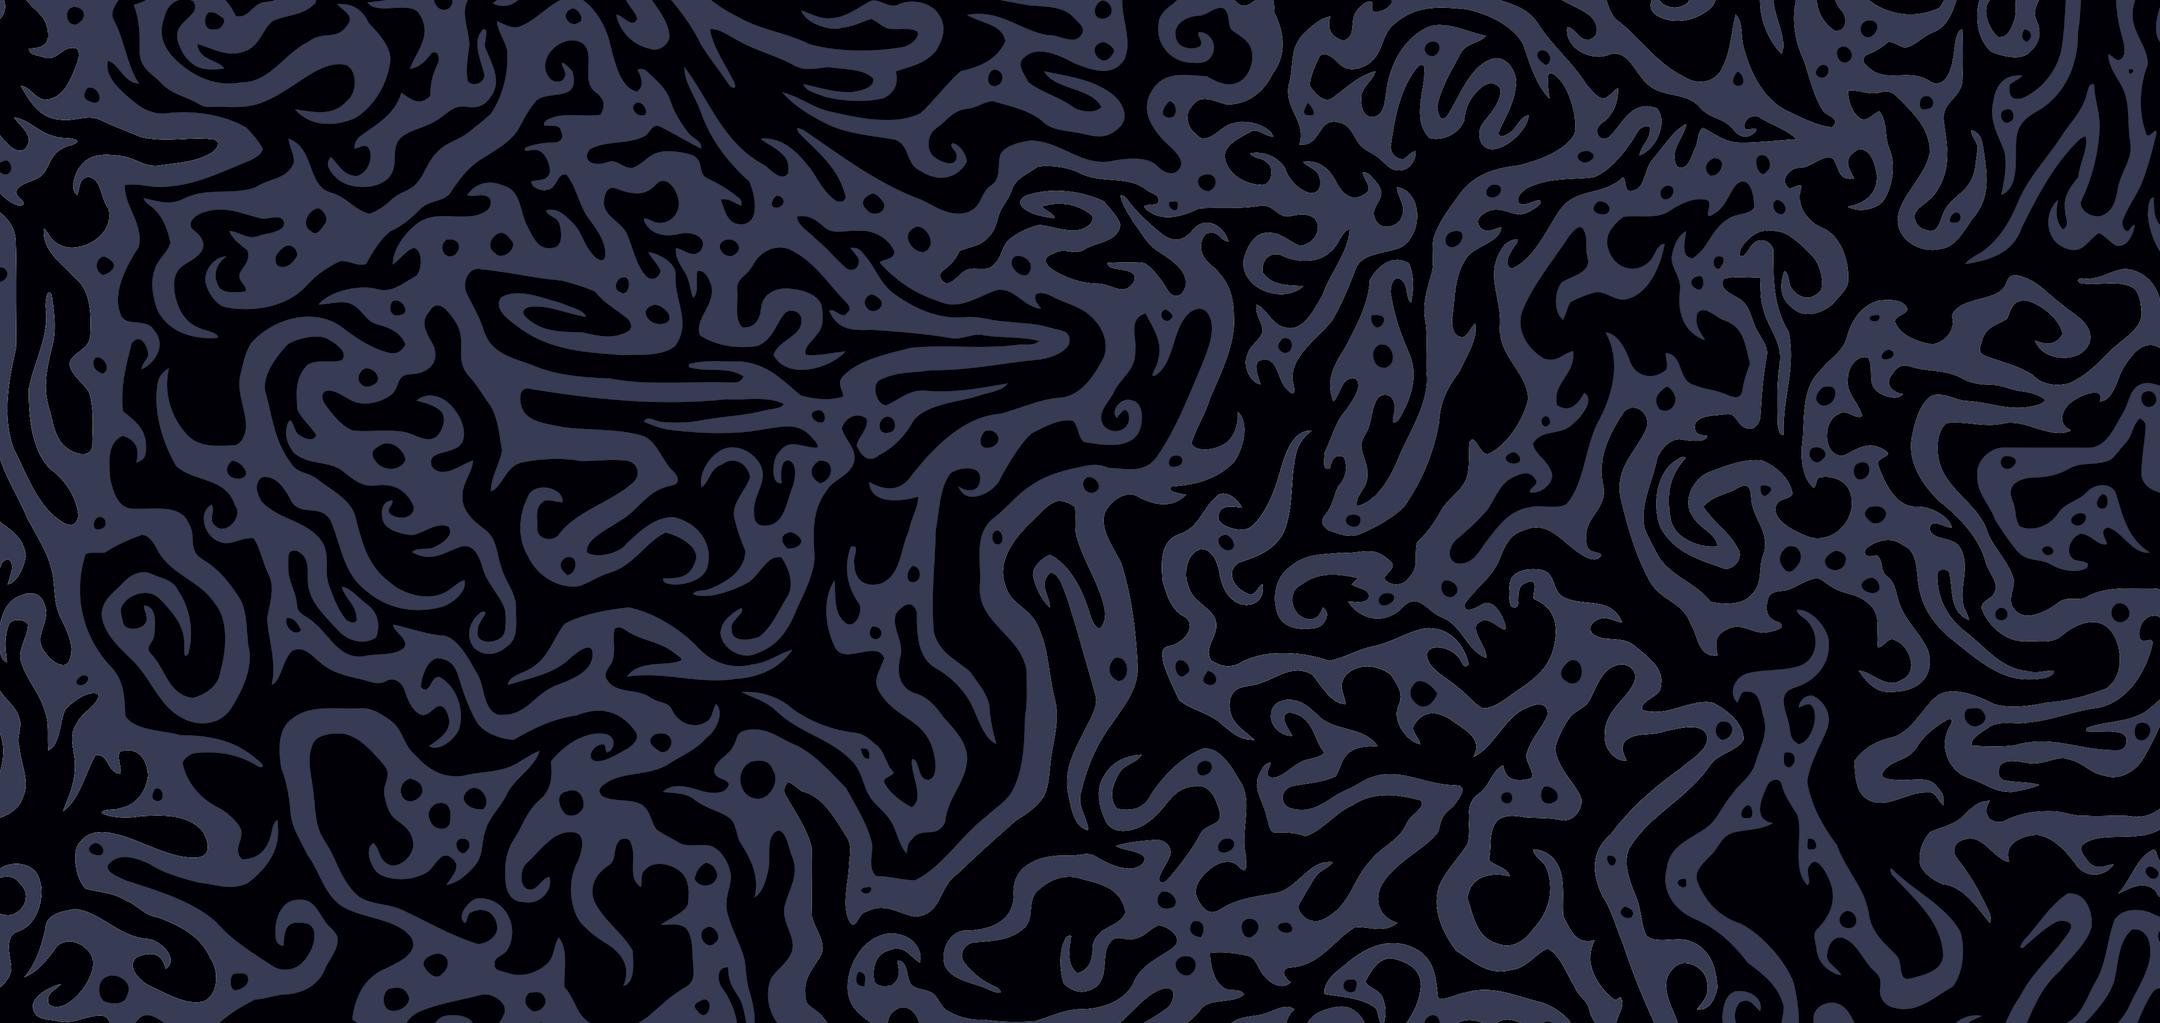 Jagged, wavy blue on black pattern